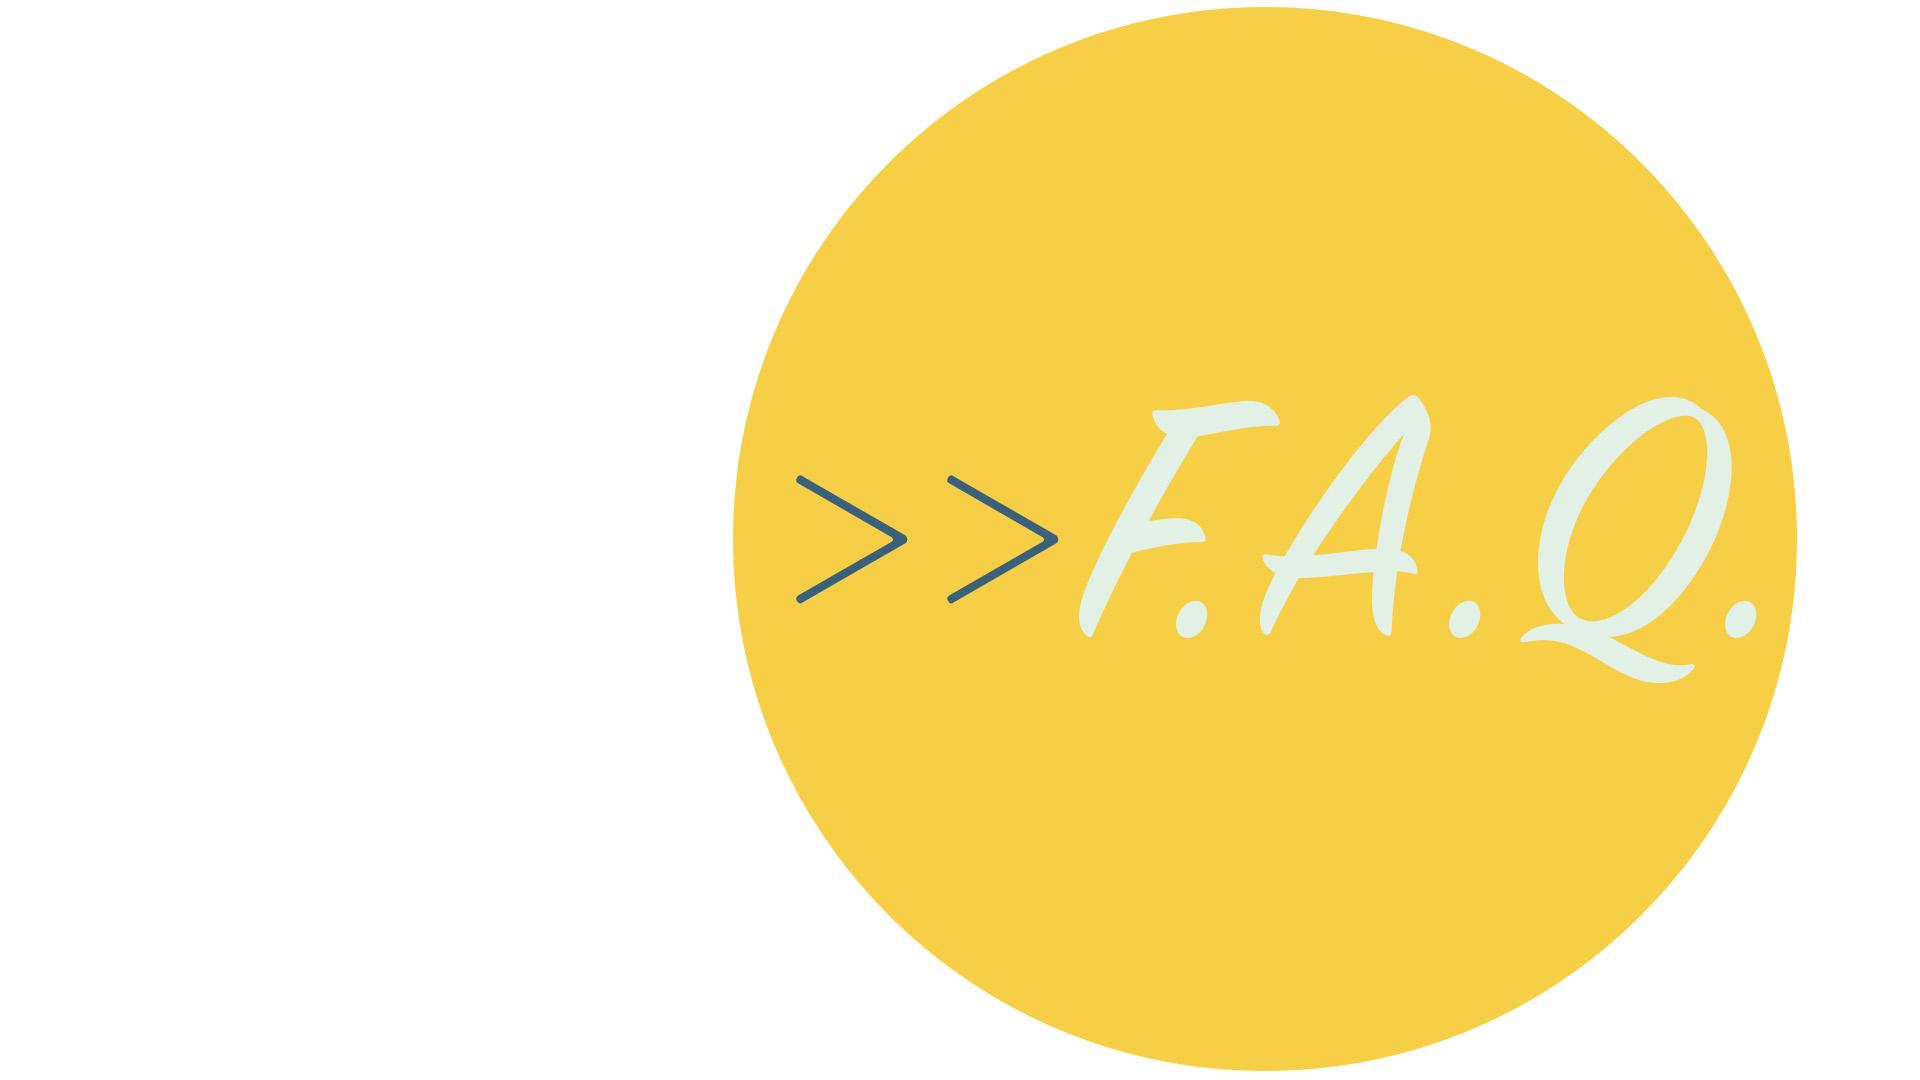 FAQcircle.jpg